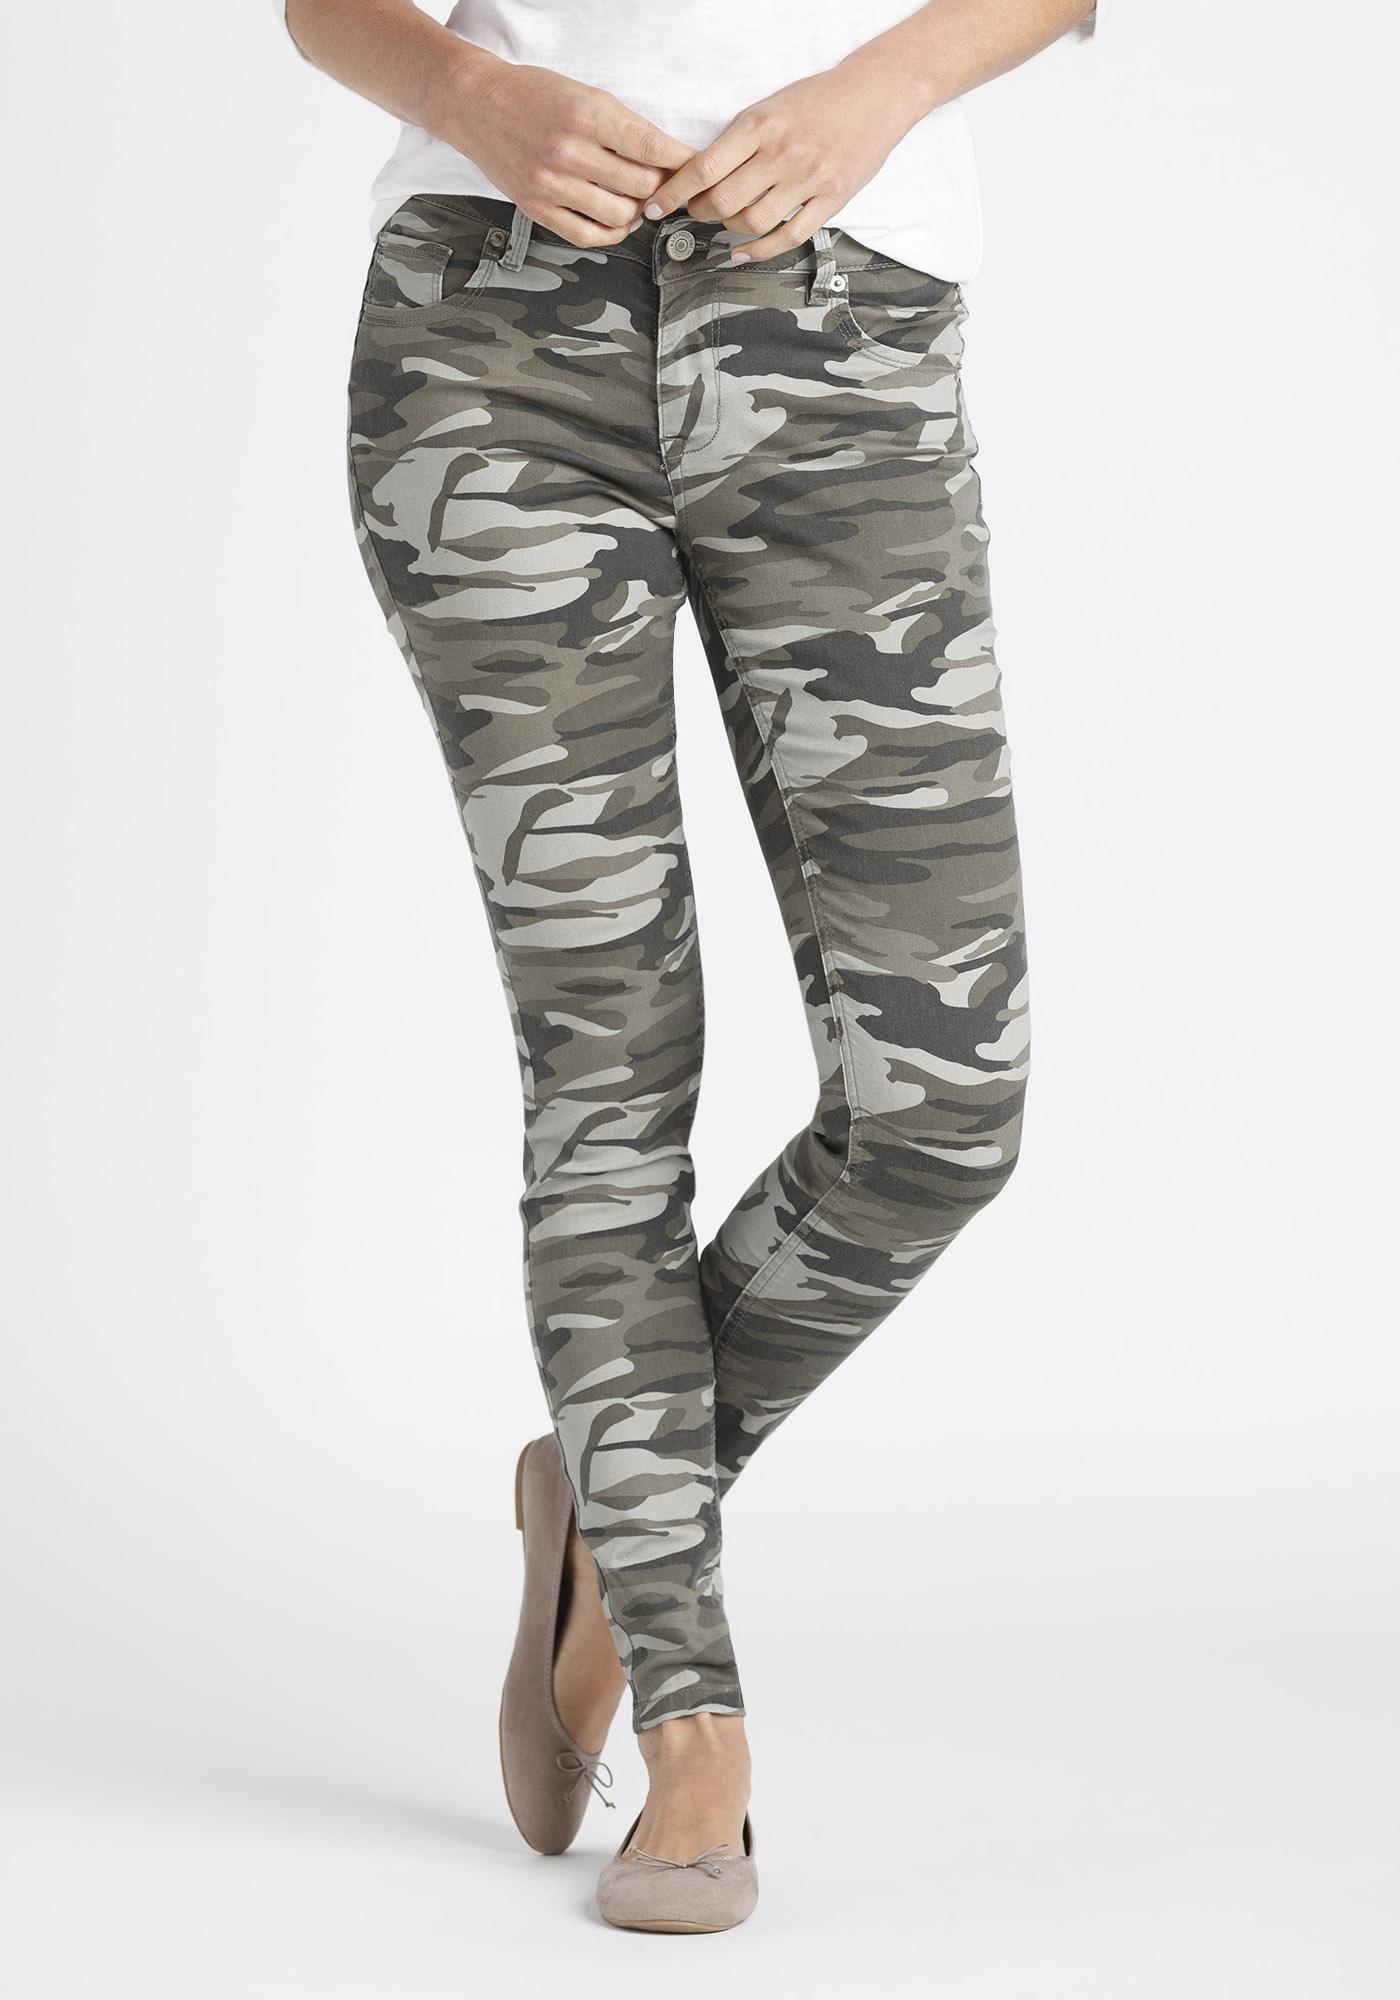 1d10b36cd15e6 Women's Camo Skinny Pants, LIGHT OLIVE, hi-res